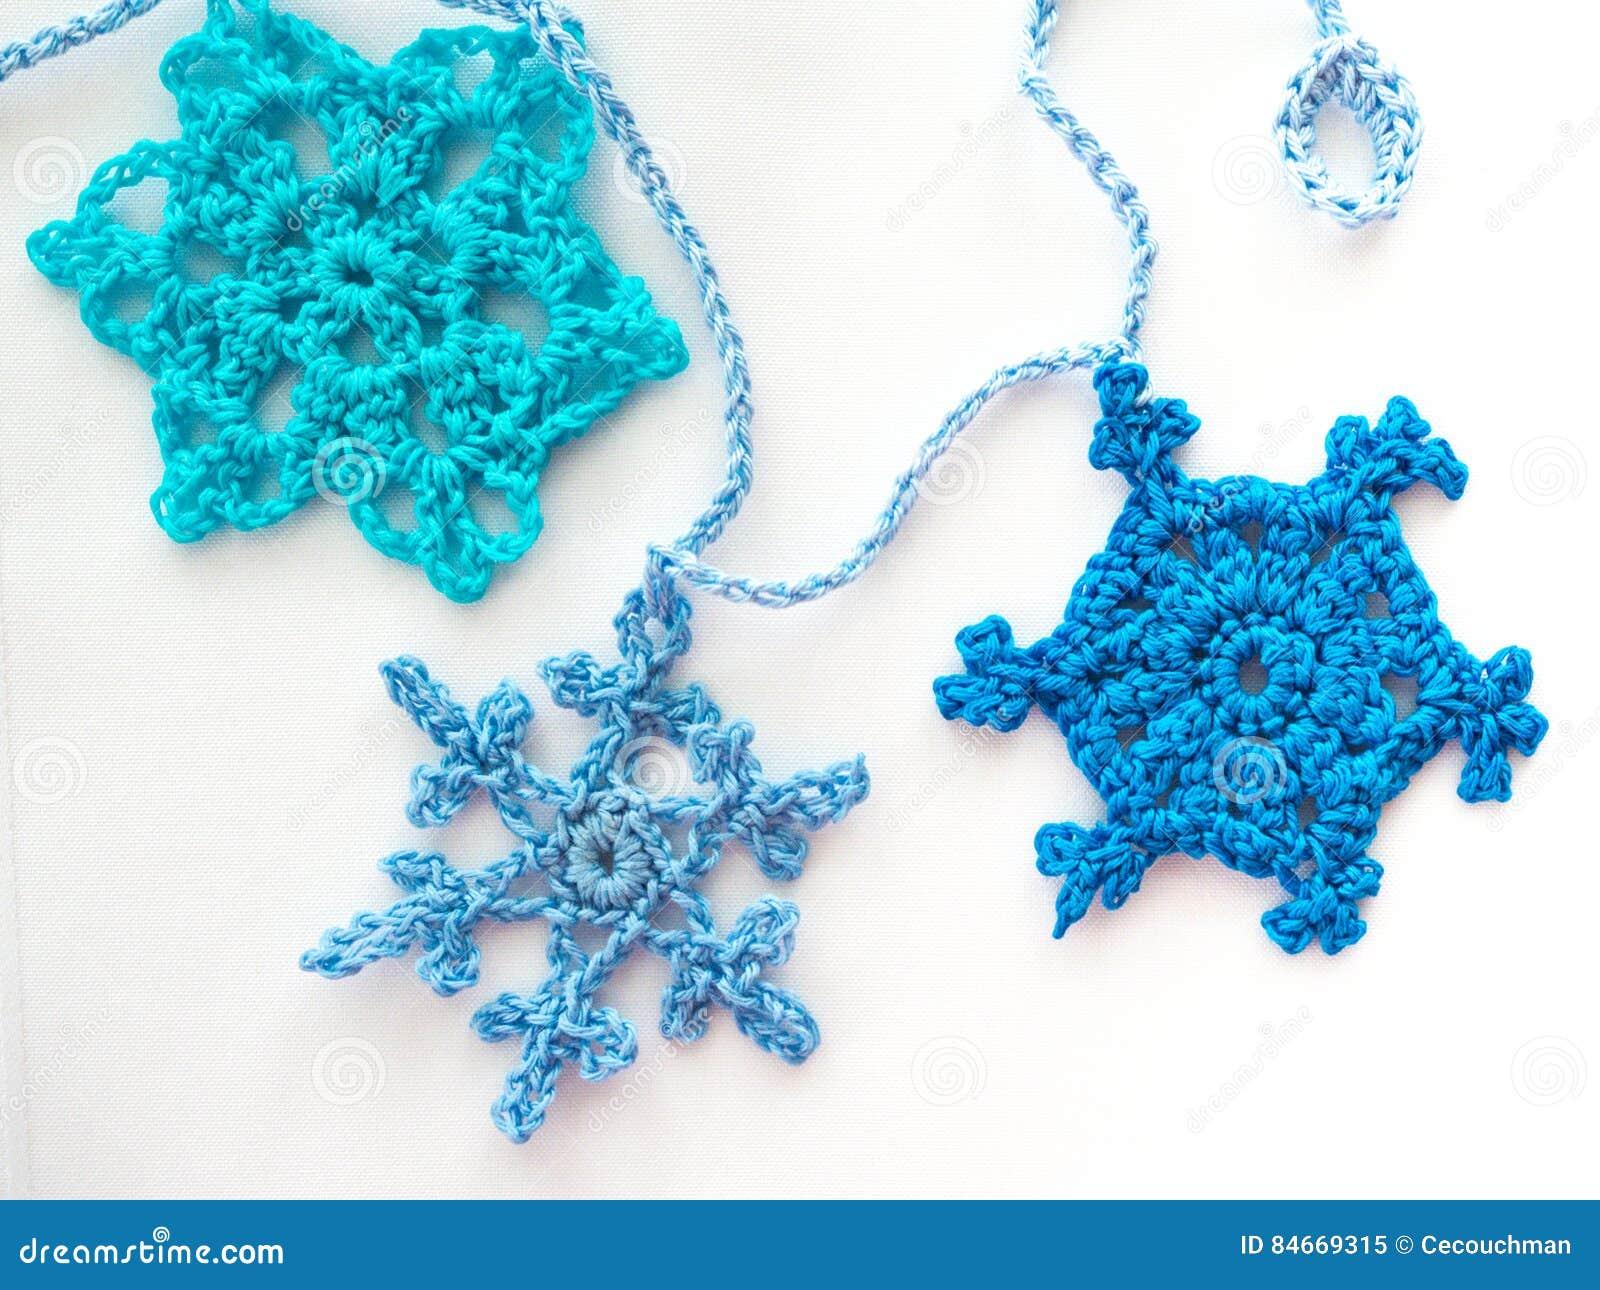 Three Crocheted Snowflakes